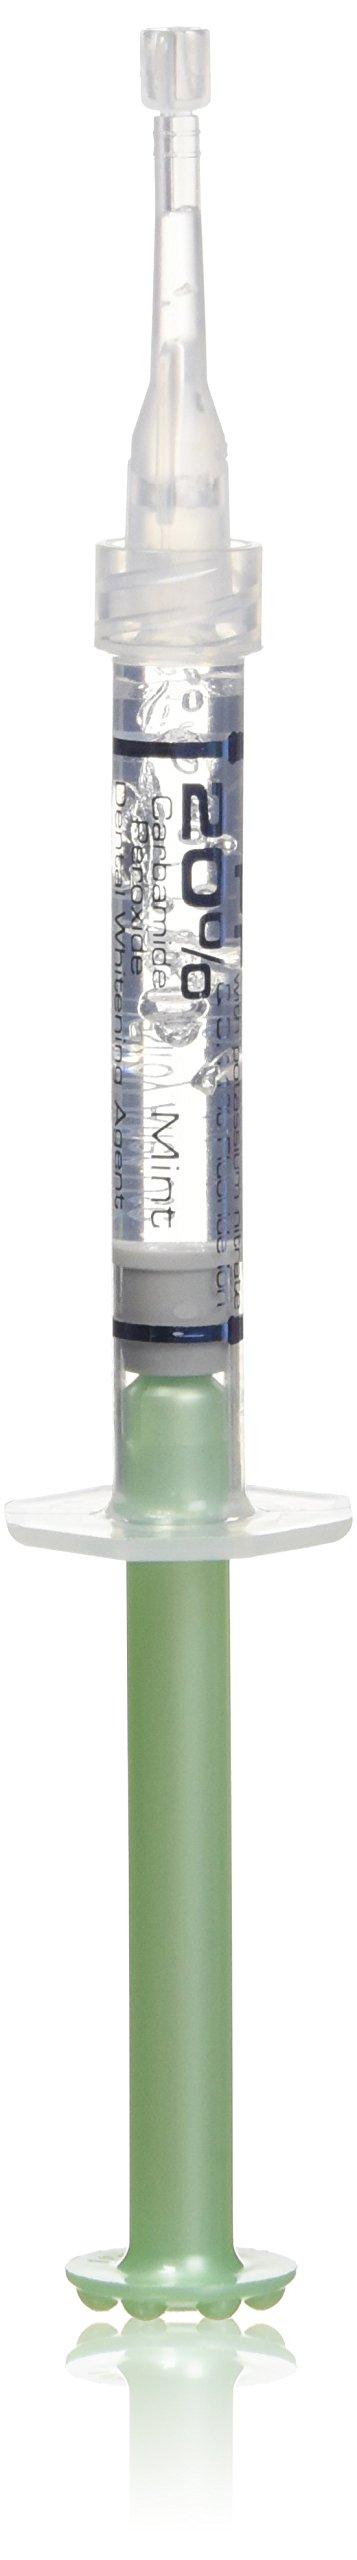 Ultradent Opalescence 20% PF Mint Refill 5400